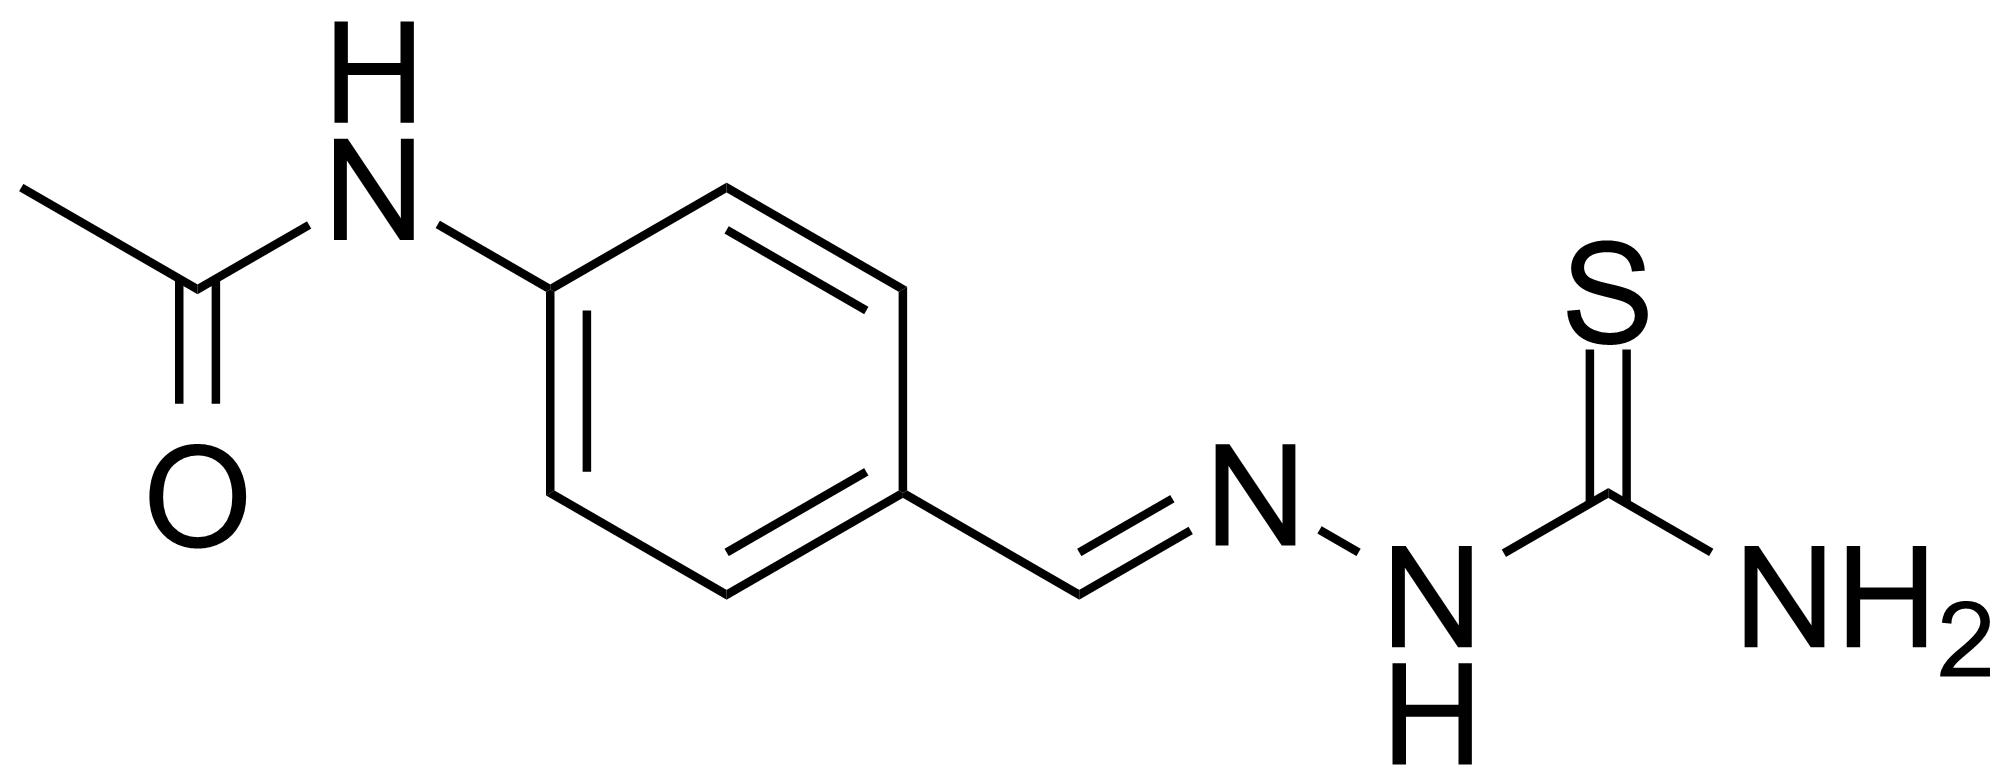 Structure of 4-Acetylaminobenzaldehyde thiosemicarbazone